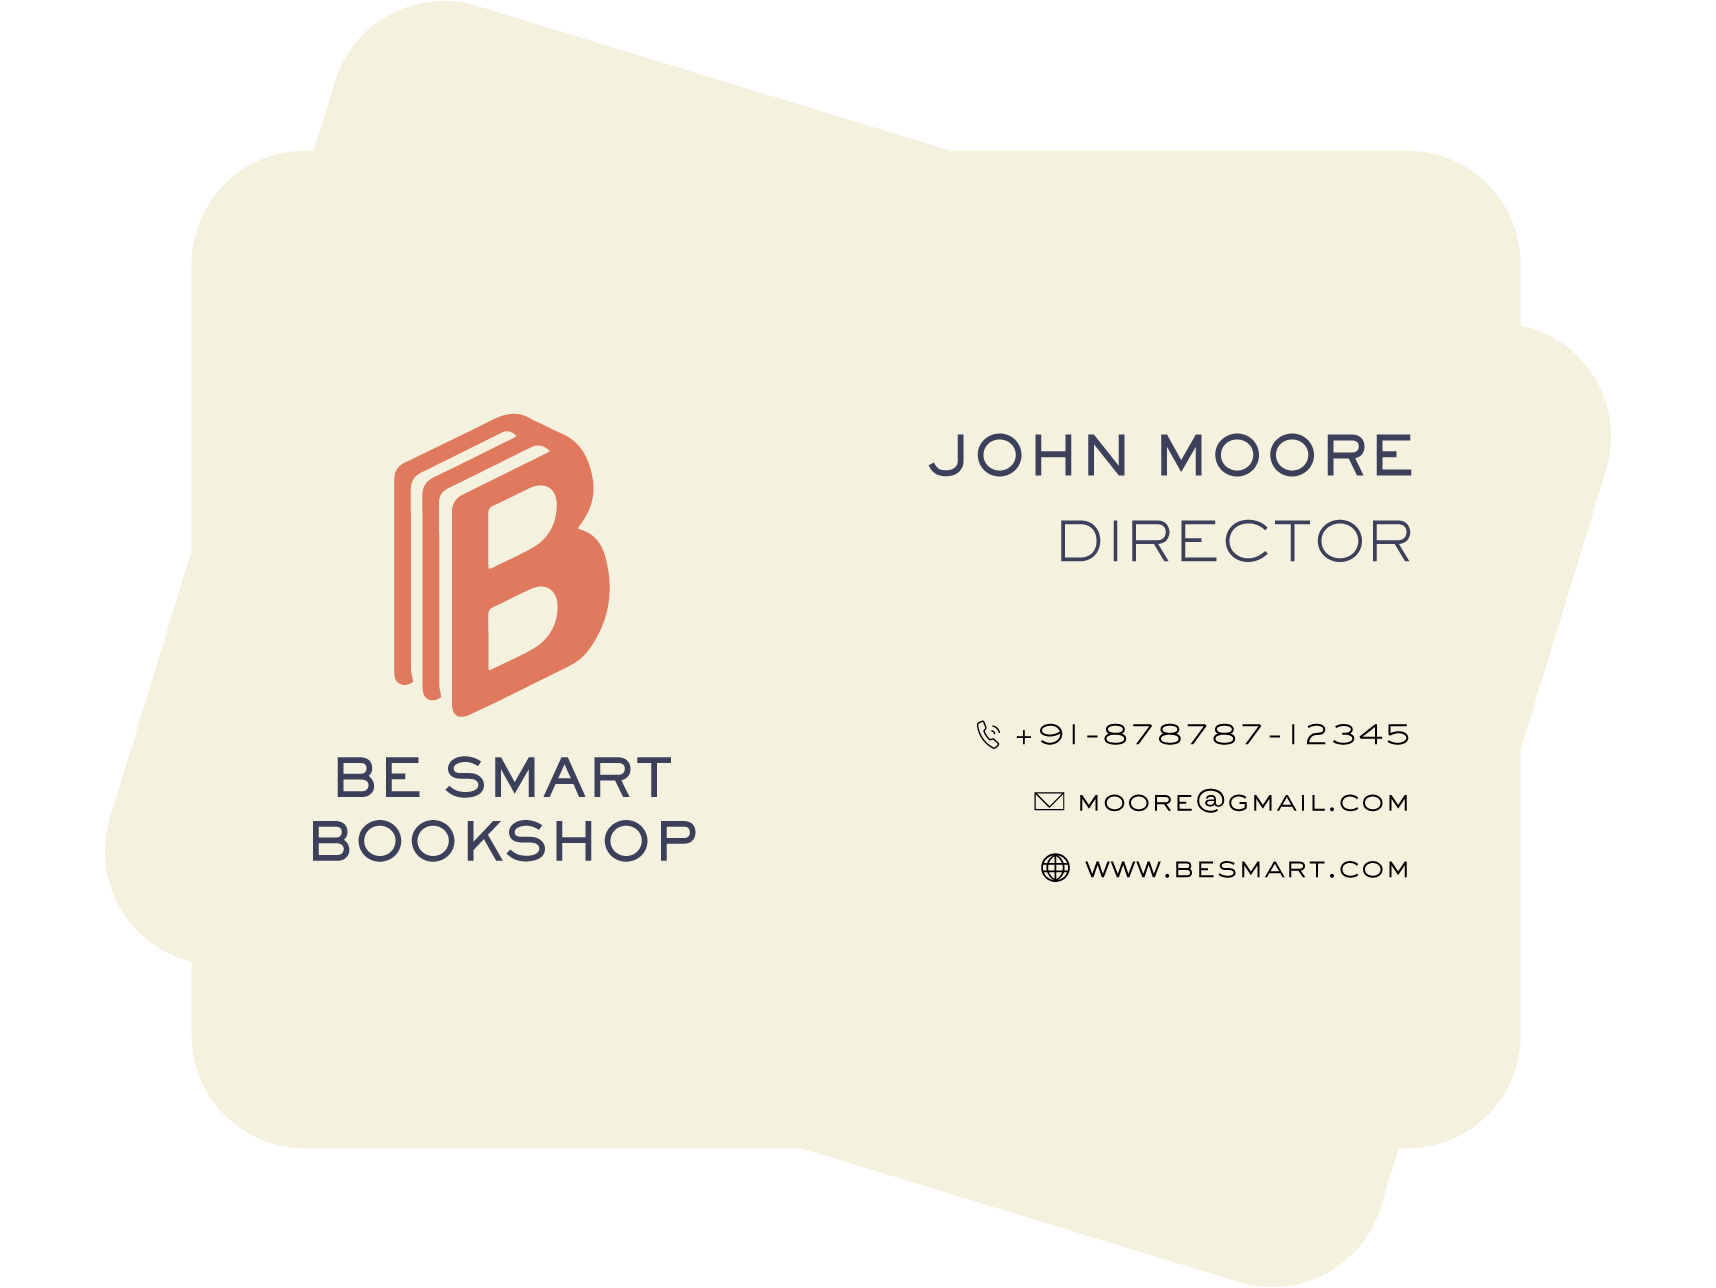 bookshop director business card design template